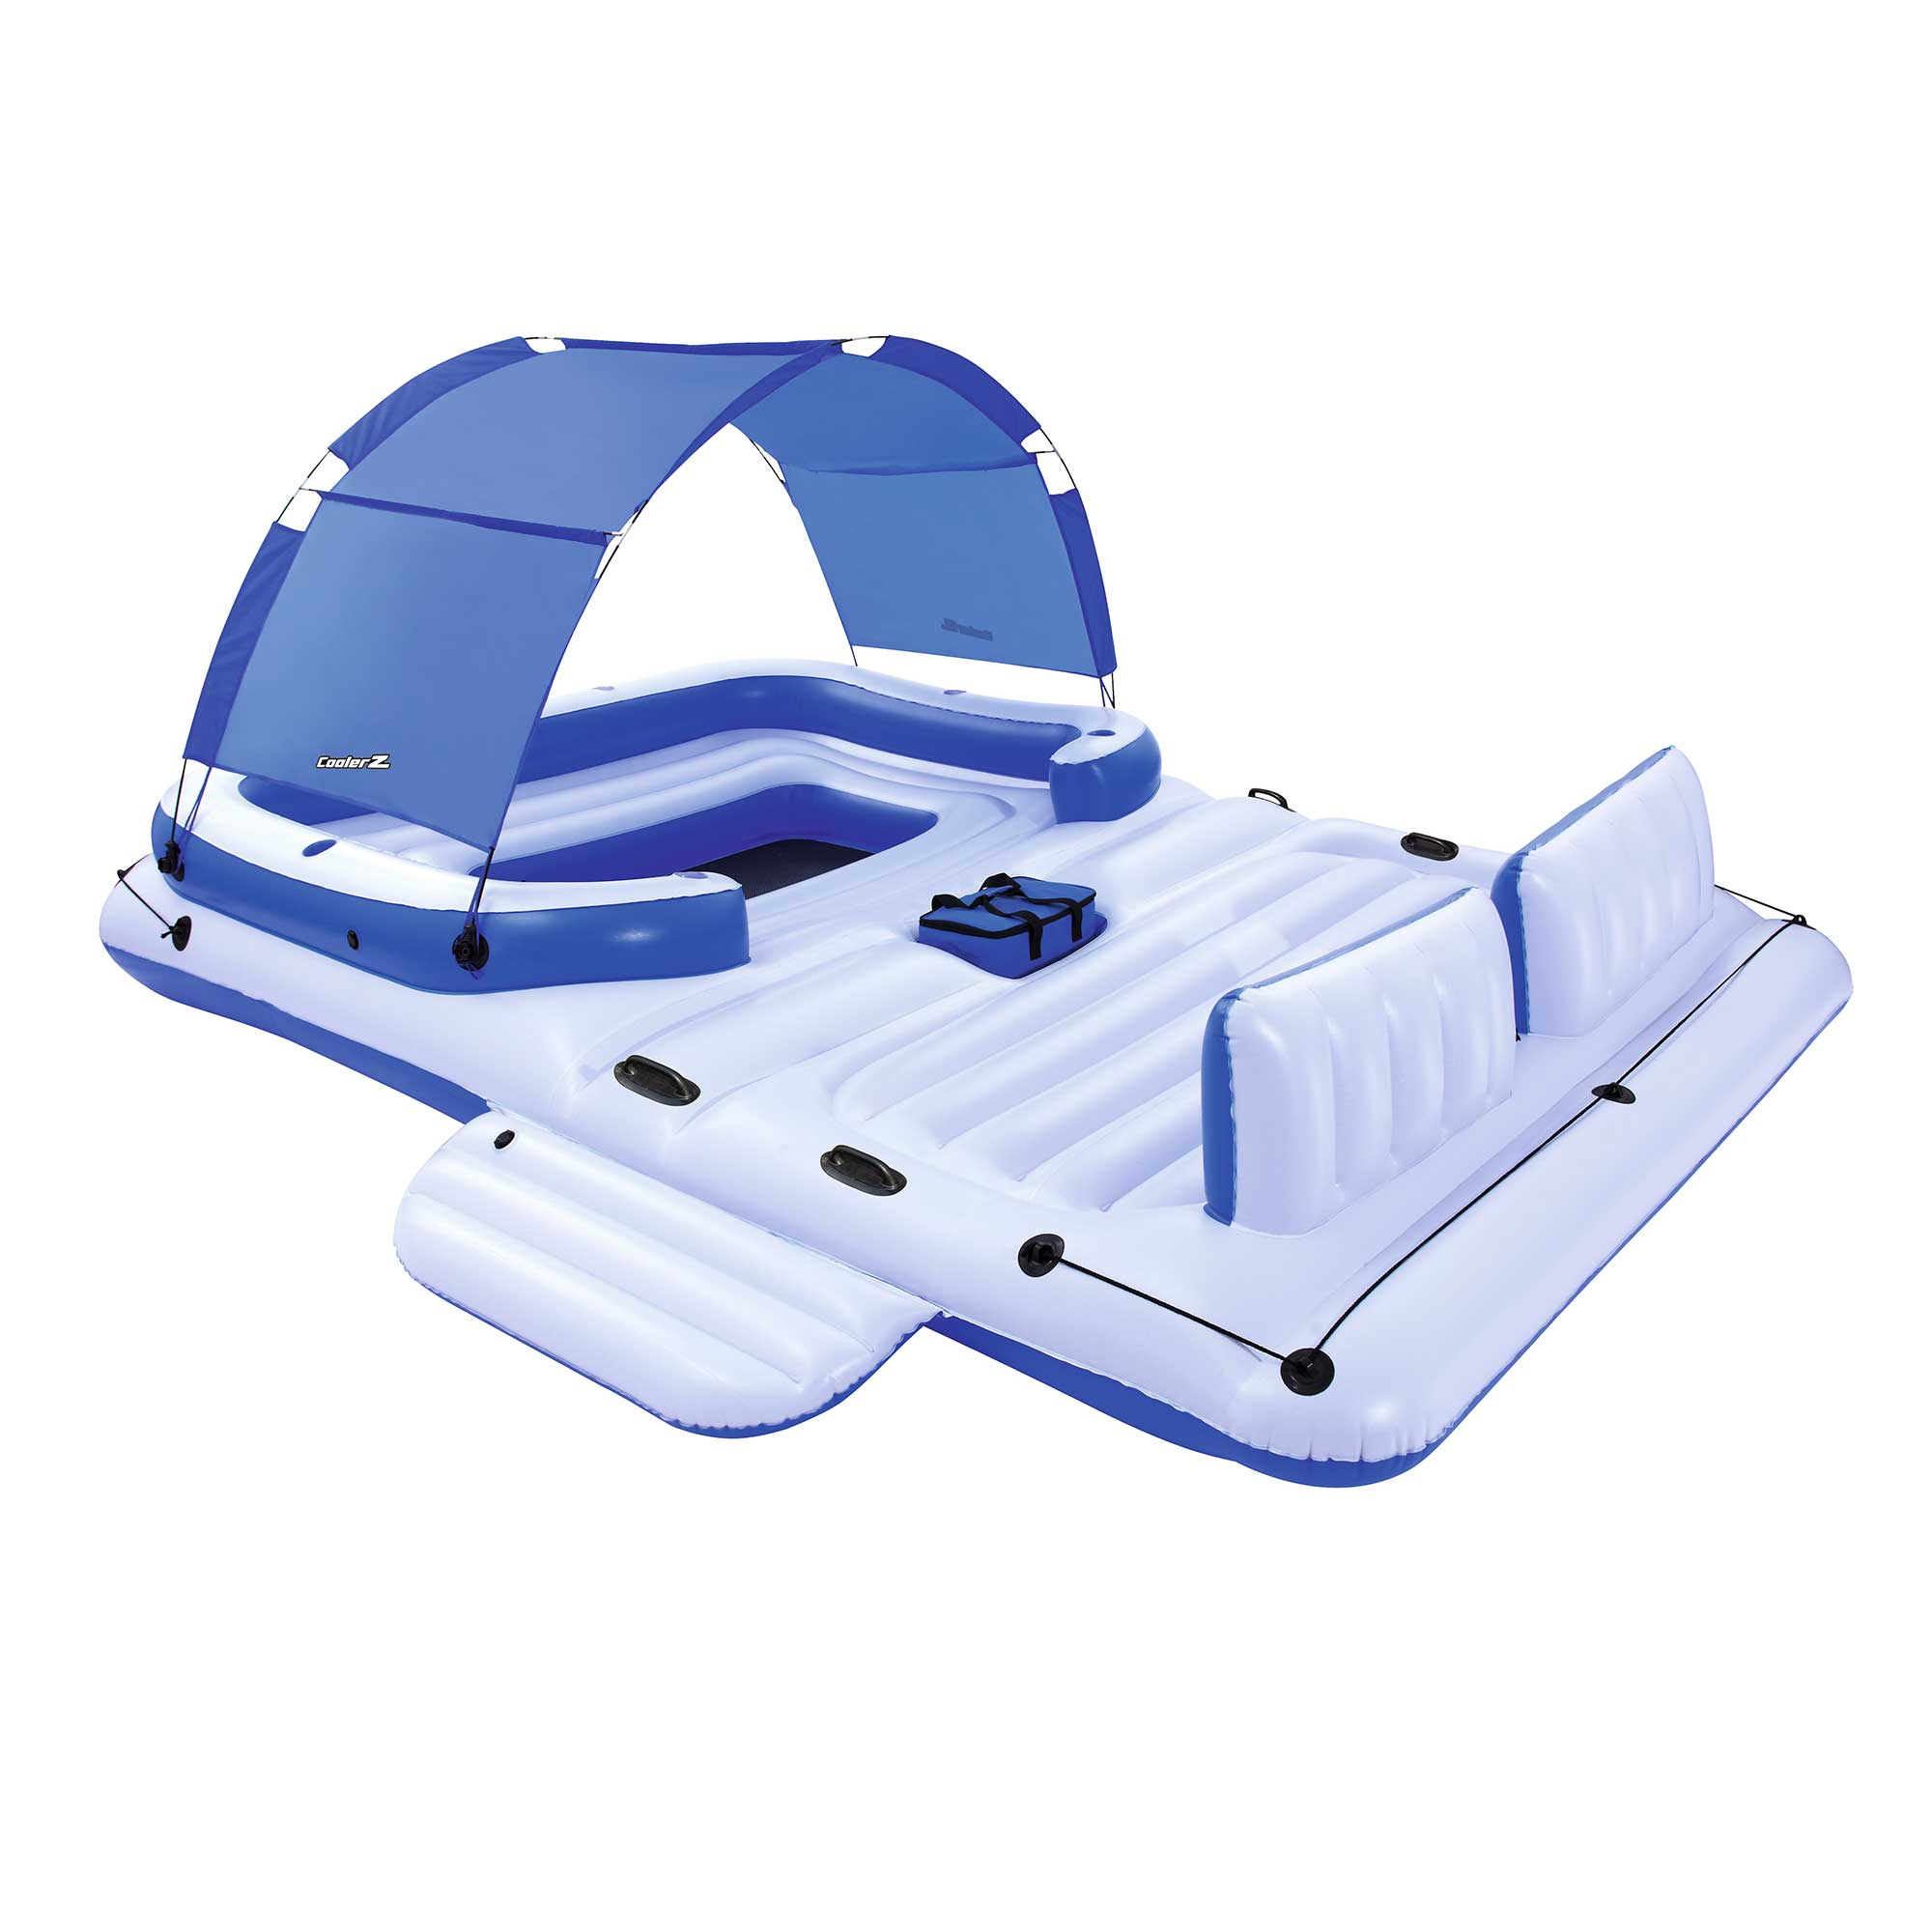 Bestway CoolerZ Tropical Breeze 6 Person Floating Island Pool Lake Raft Lounge by Bestway